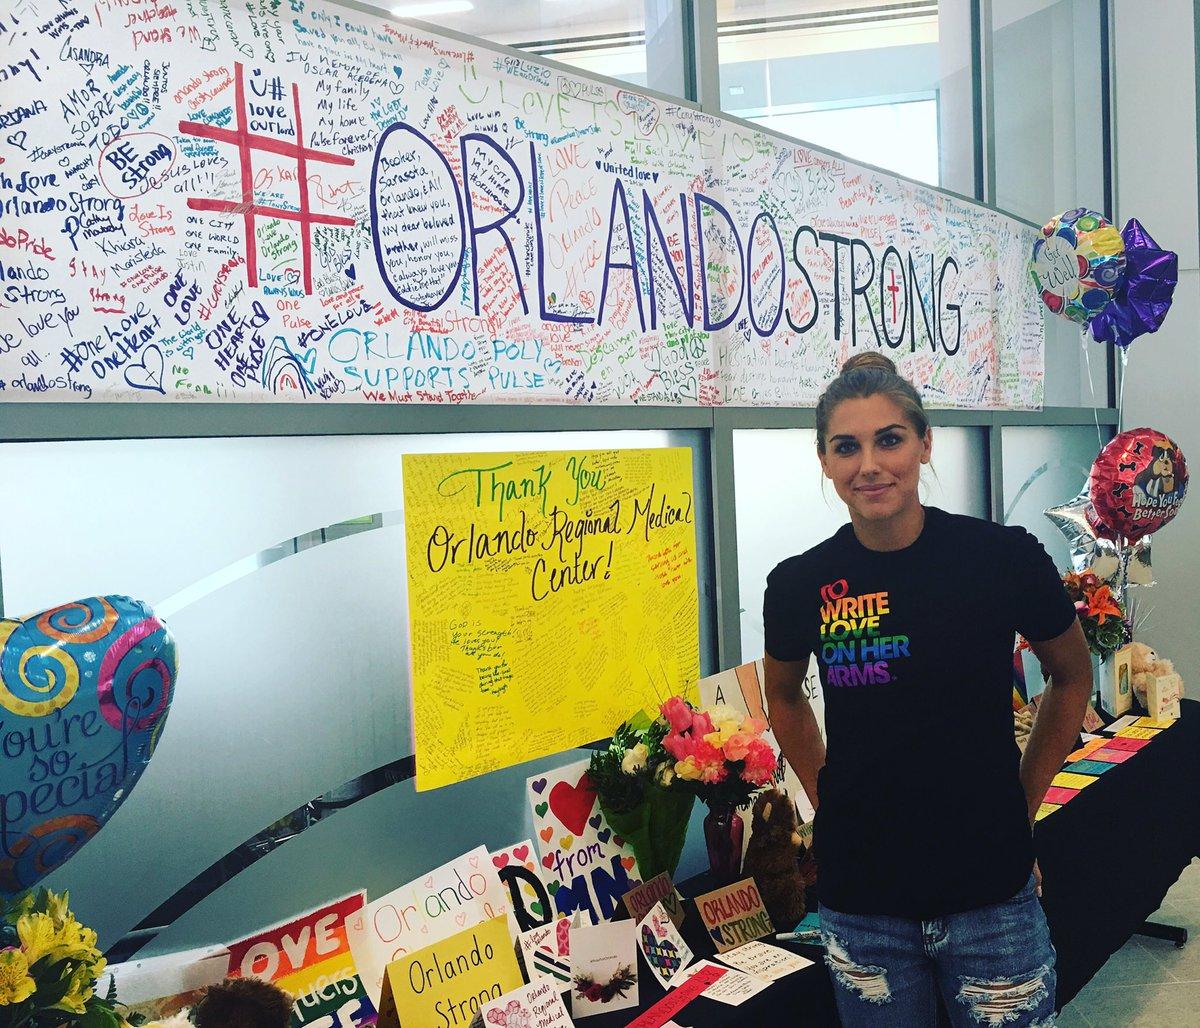 Thanks to @alexmorgan13 for visiting #PulseShooting victims at #ORMC today. #OrlandoUnited #OrlandoStrong https://t.co/GIJyqCleHa